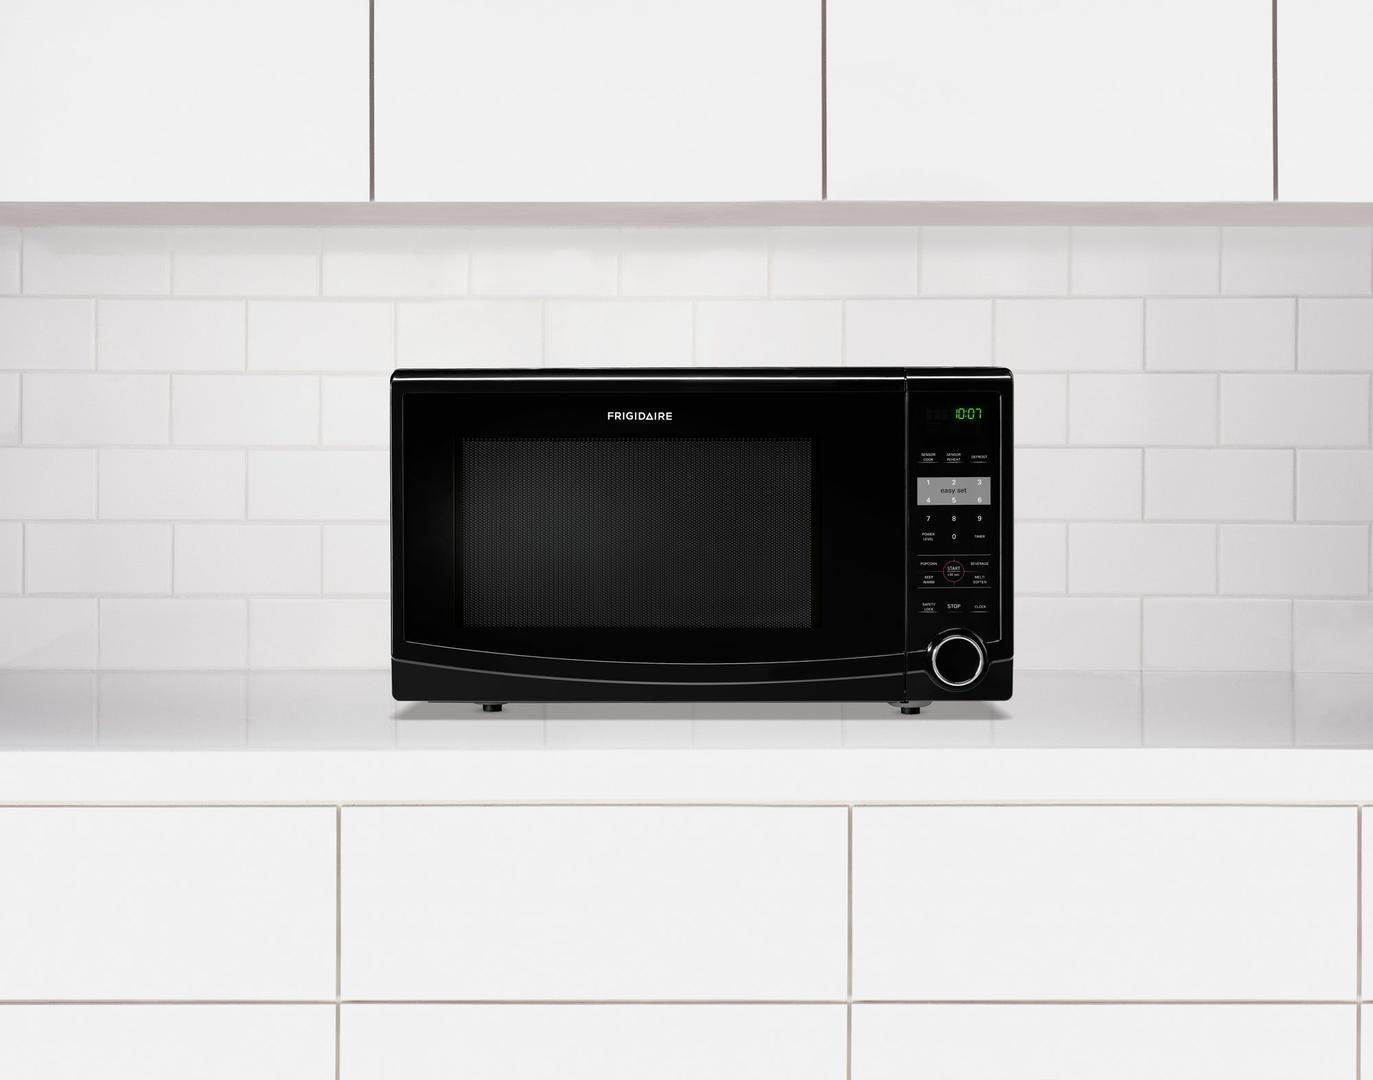 Countertop Microwave 12 Inch Depth : FFCM1134L Frigidaire ffcm1134l Countertop Microwaves